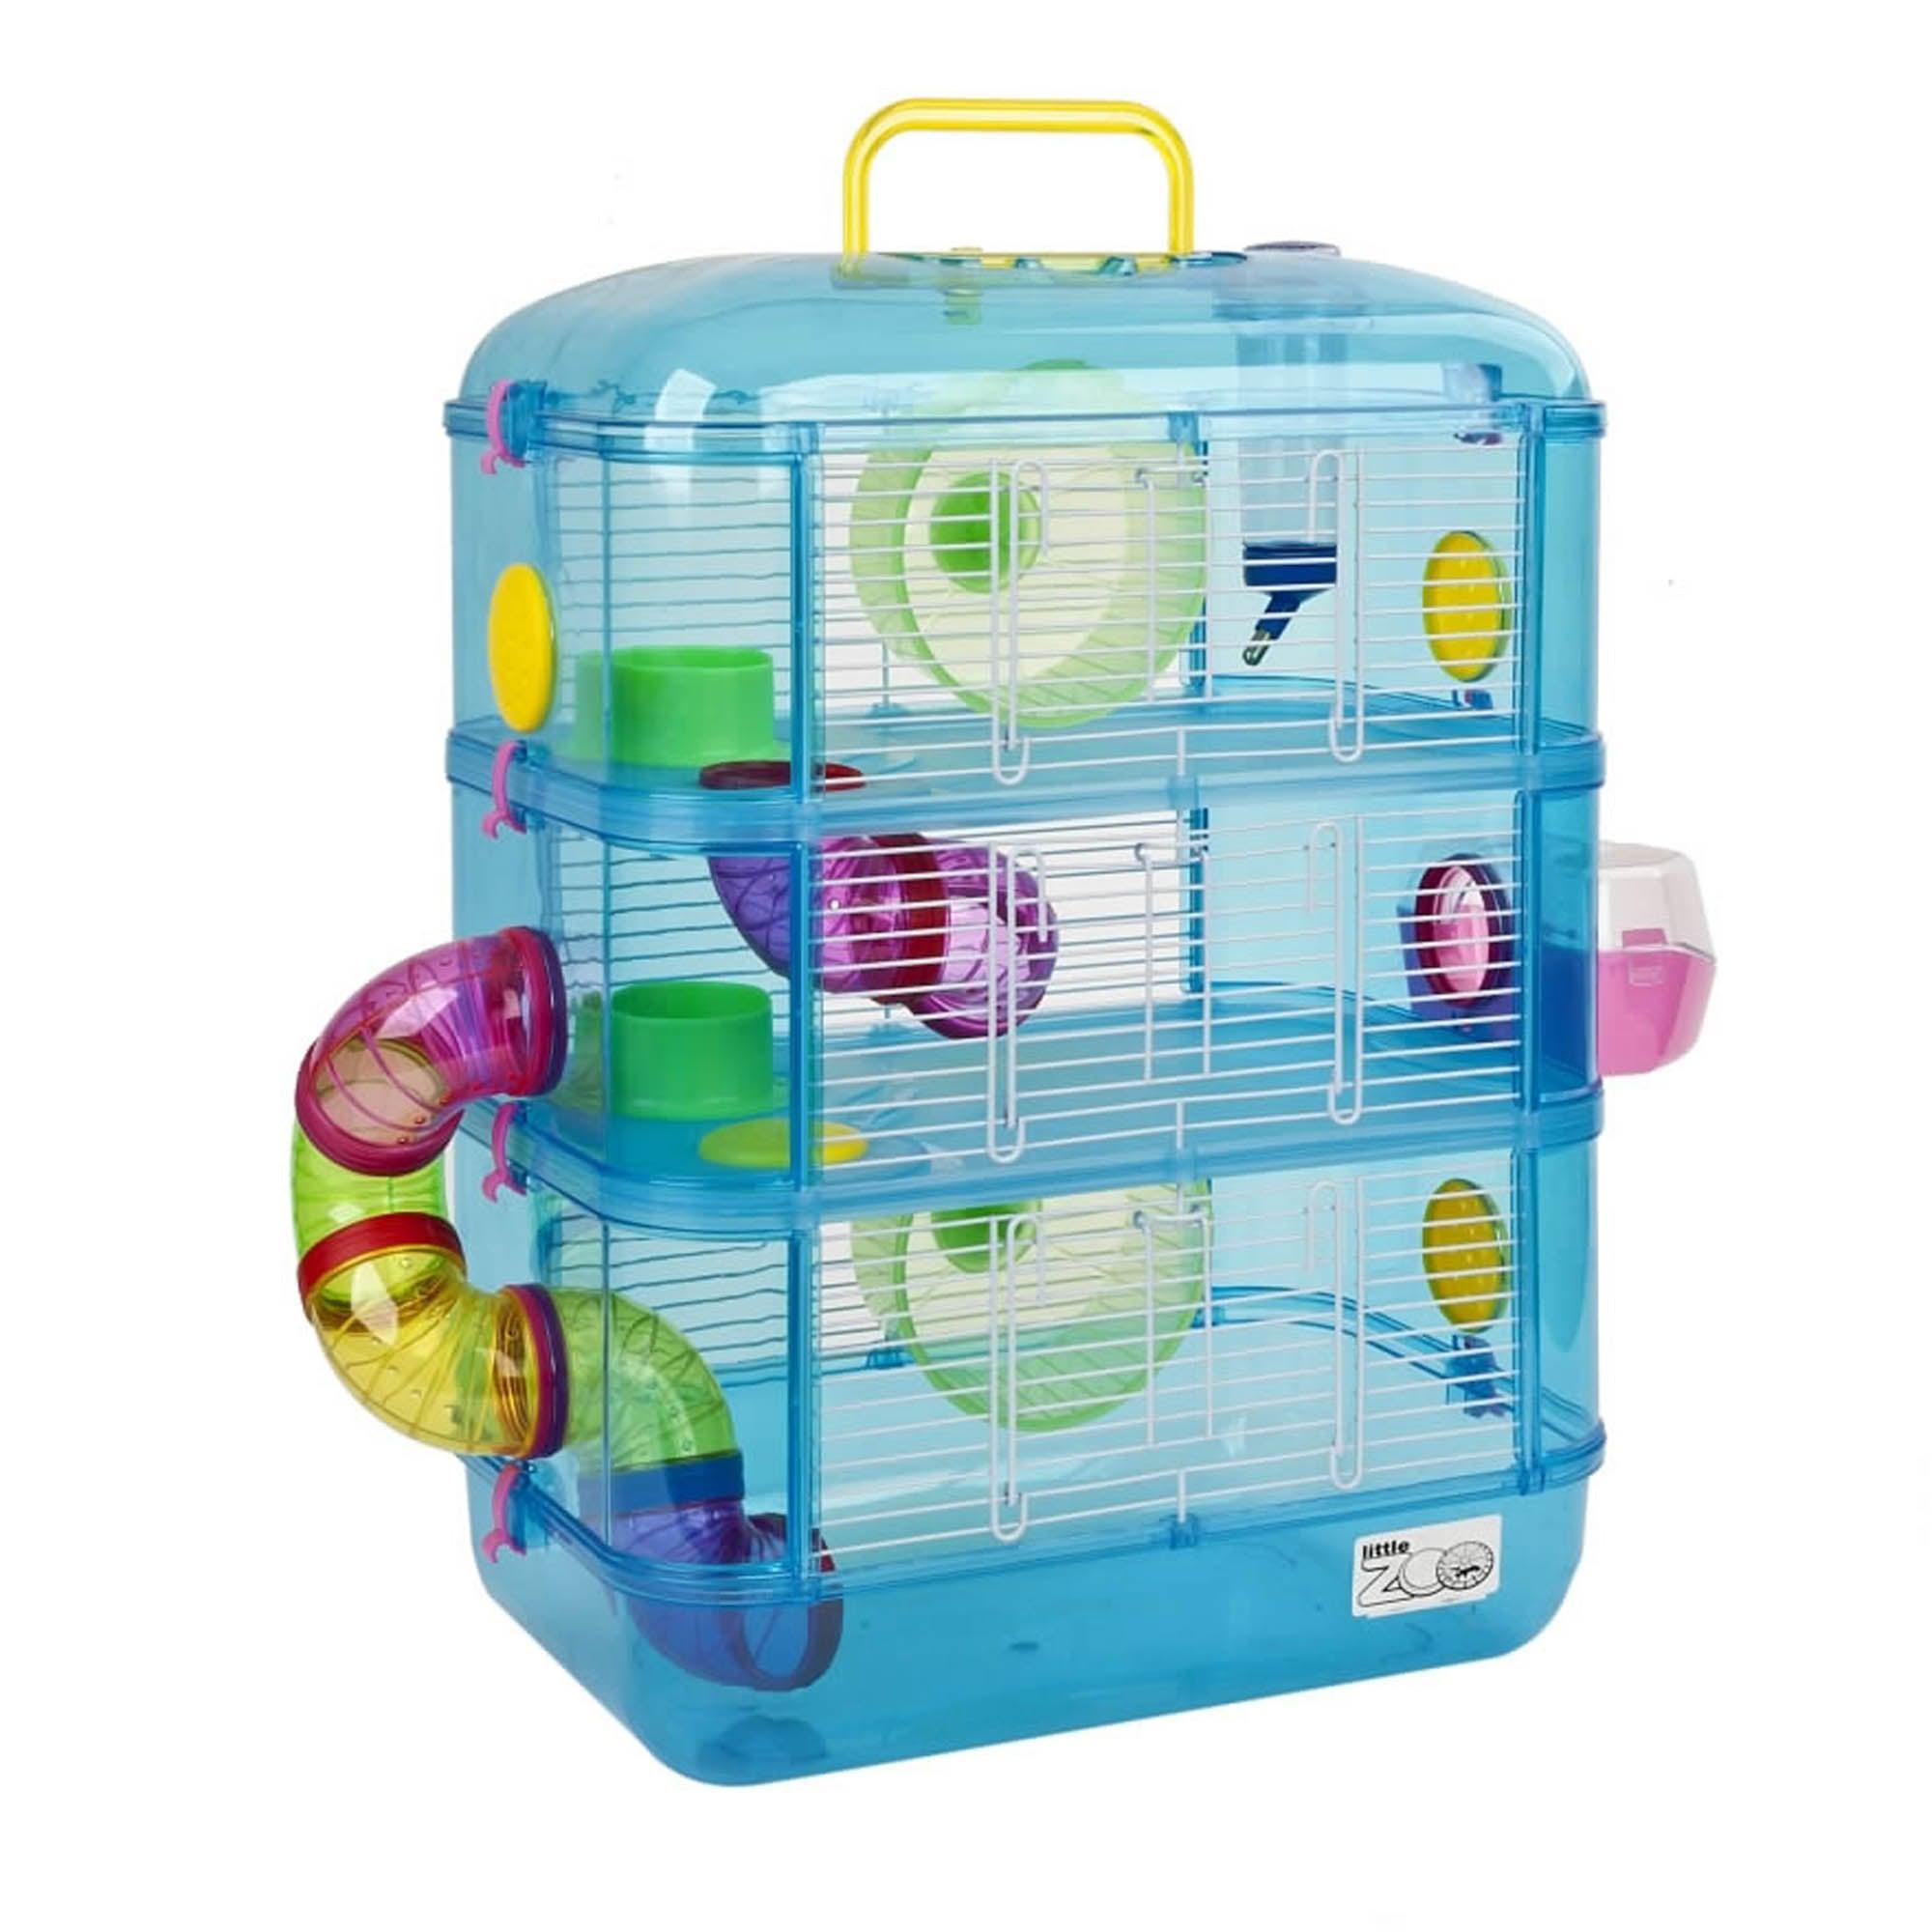 Fantasia Blue Hamster Cage Kingfisher (Blue)